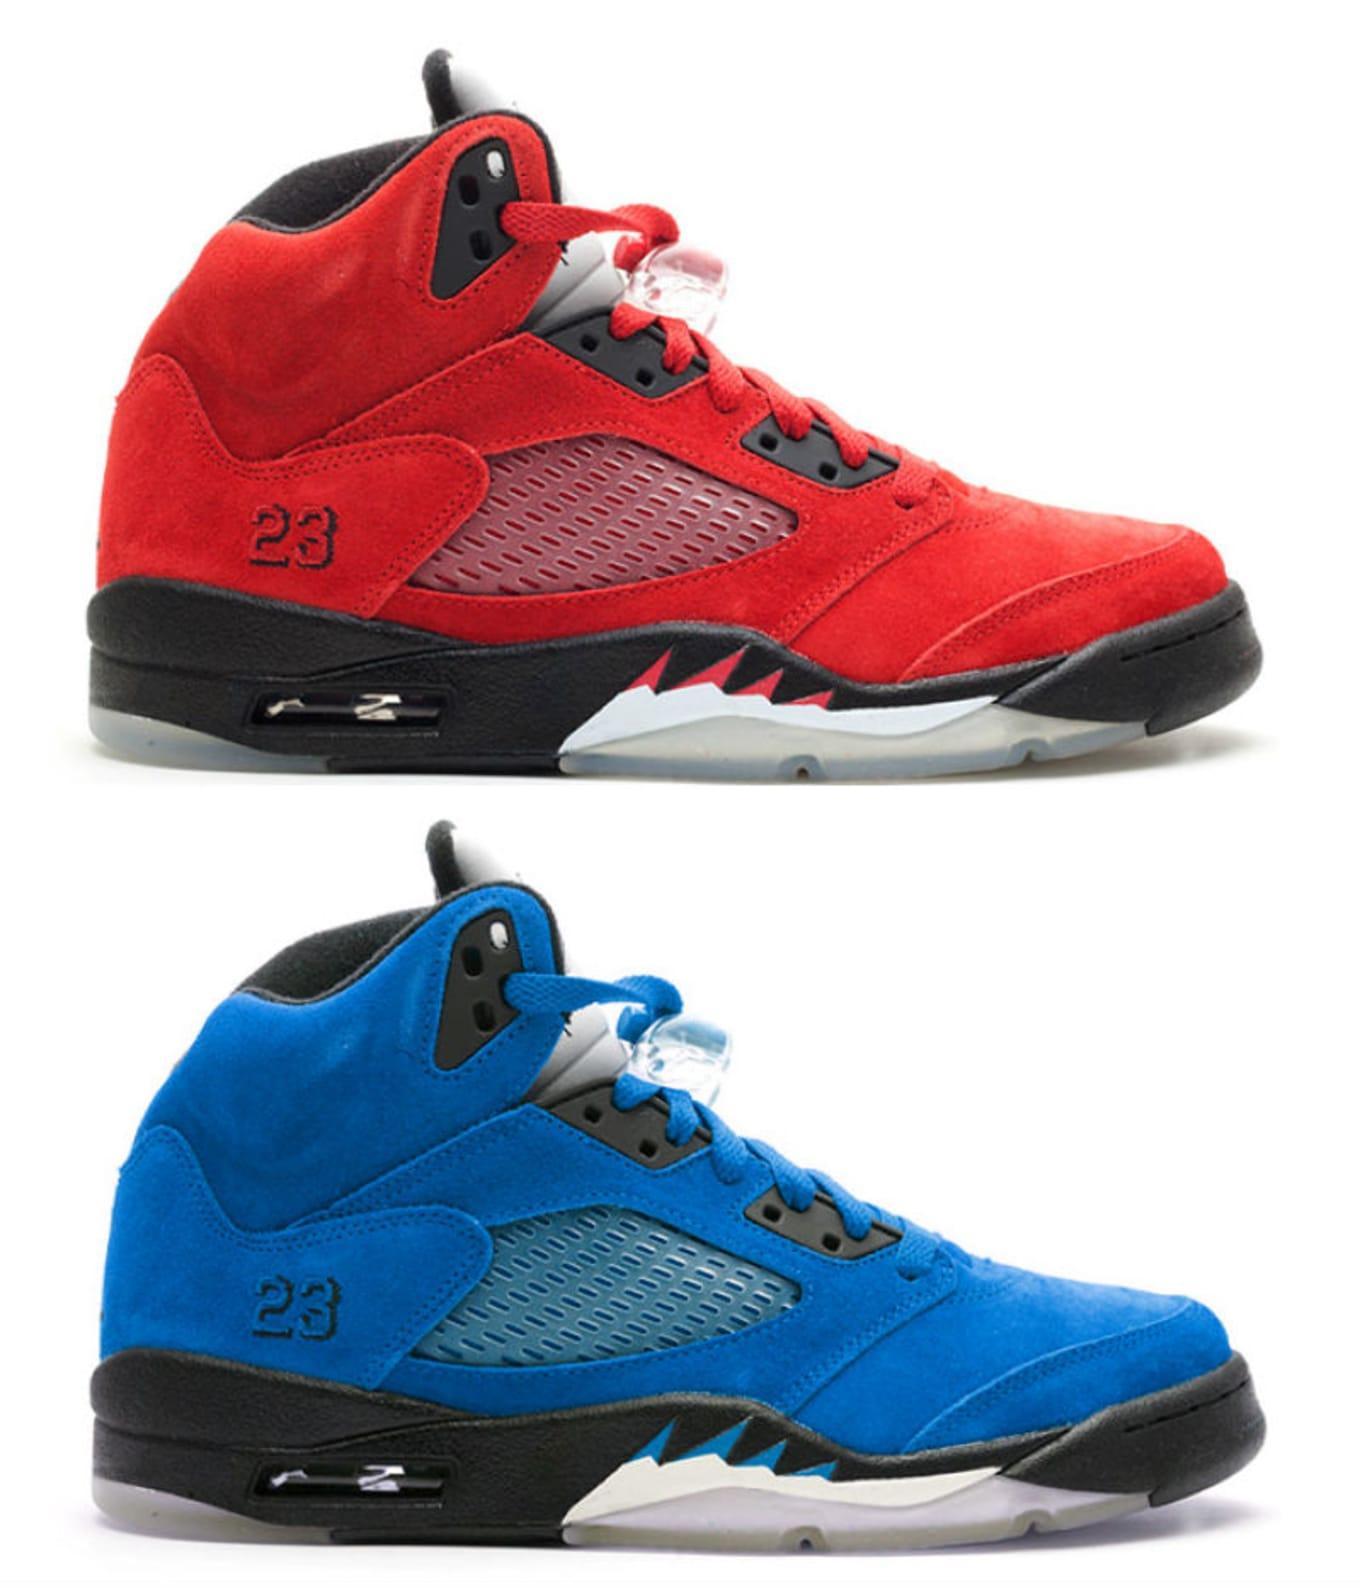 c4707bf963ce Air Jordan 5 Retro Red   Blue Suede